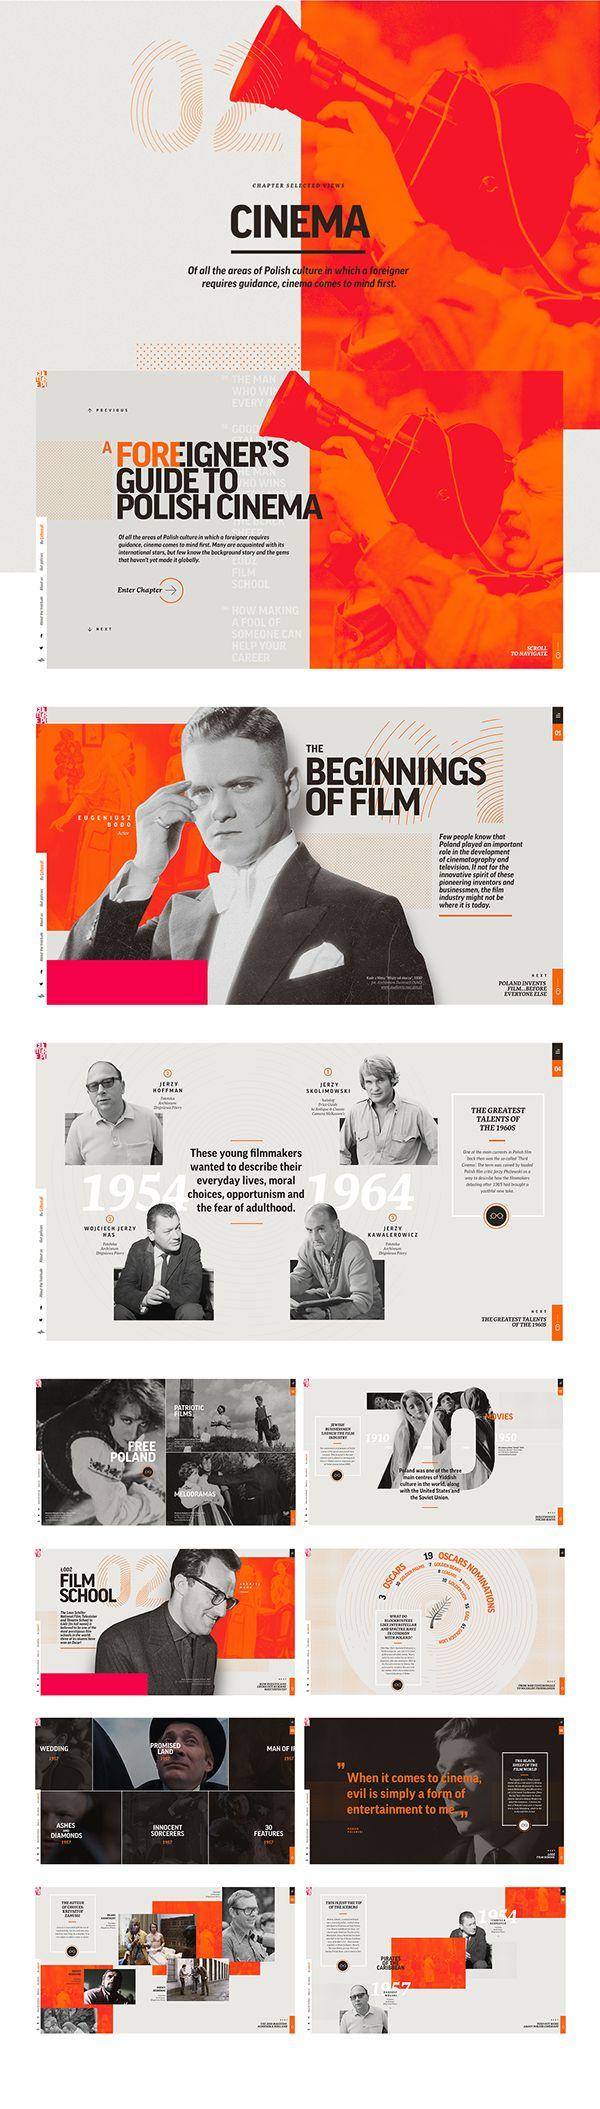 Presentation design layout. Inspirational presentation design samples. Visit us at: www.sodapopmedia.com #PresentationDesign #Presentation #Multimedia #Interactive #Keynote #PowerPoint #BusinessPresentation